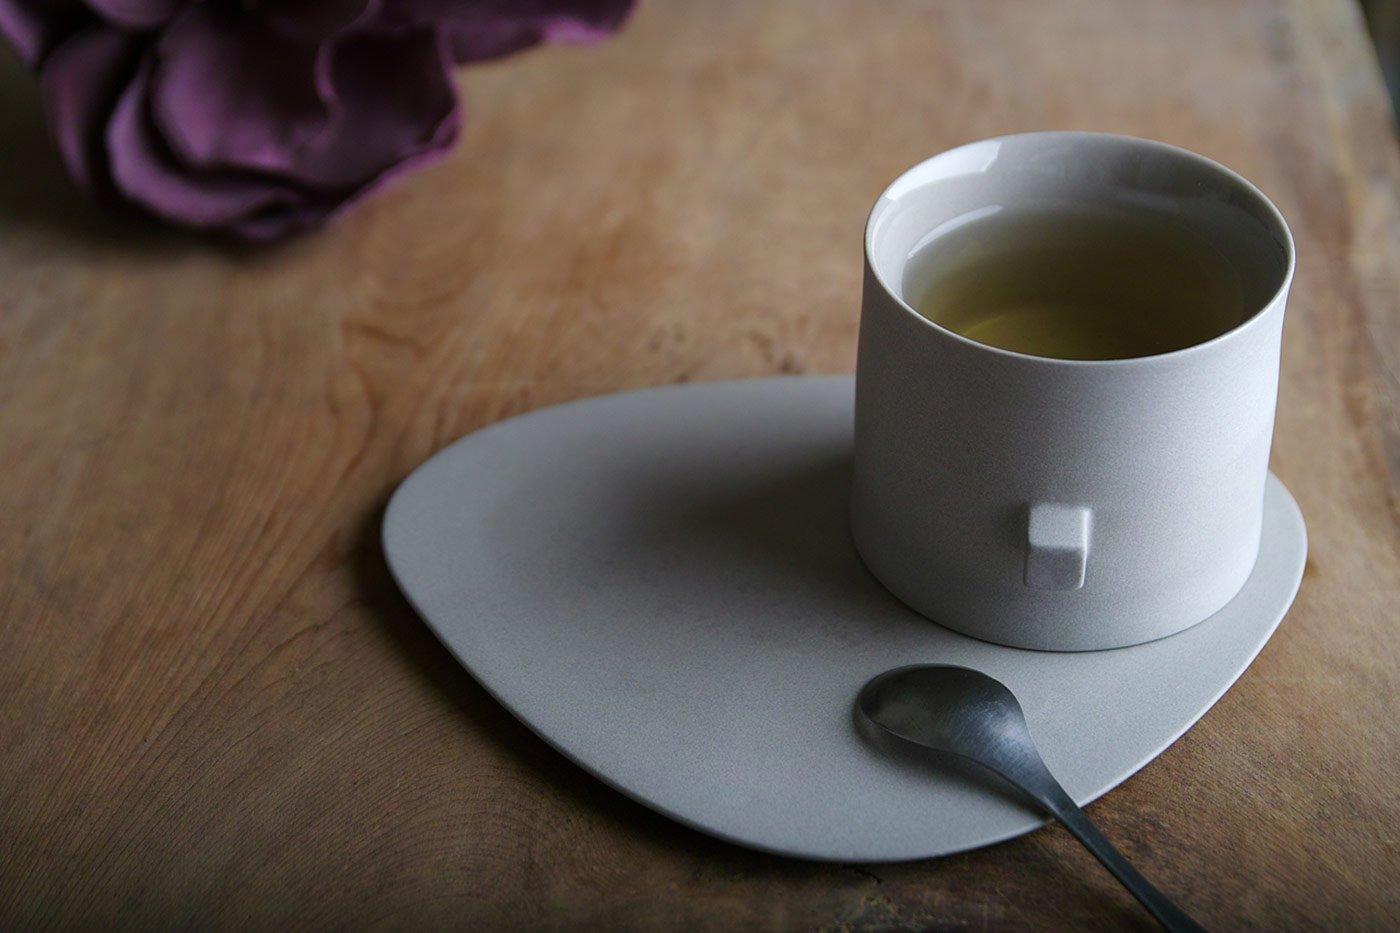 Round Square Teaware by Koan Design